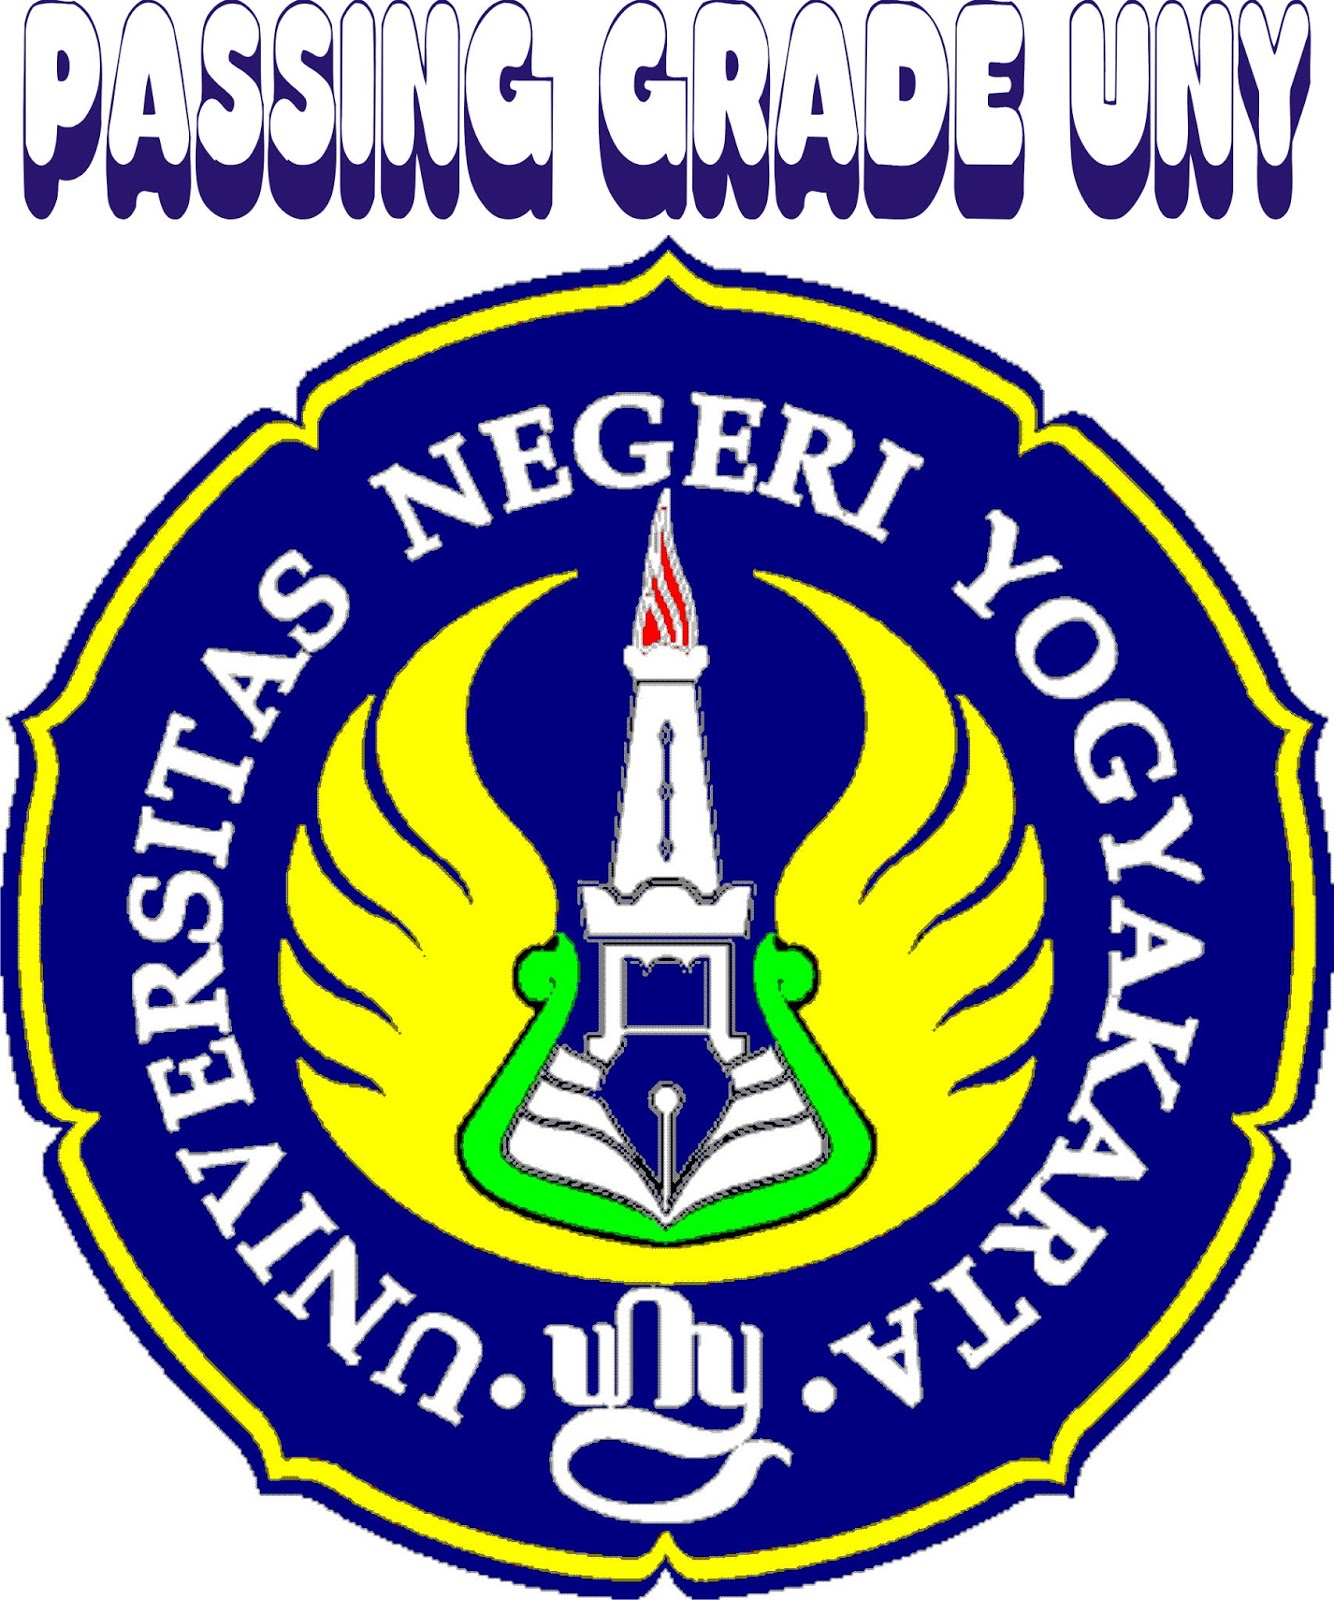 Passing Grade Universitas Negeri Yogyakarta (UNY) 2014